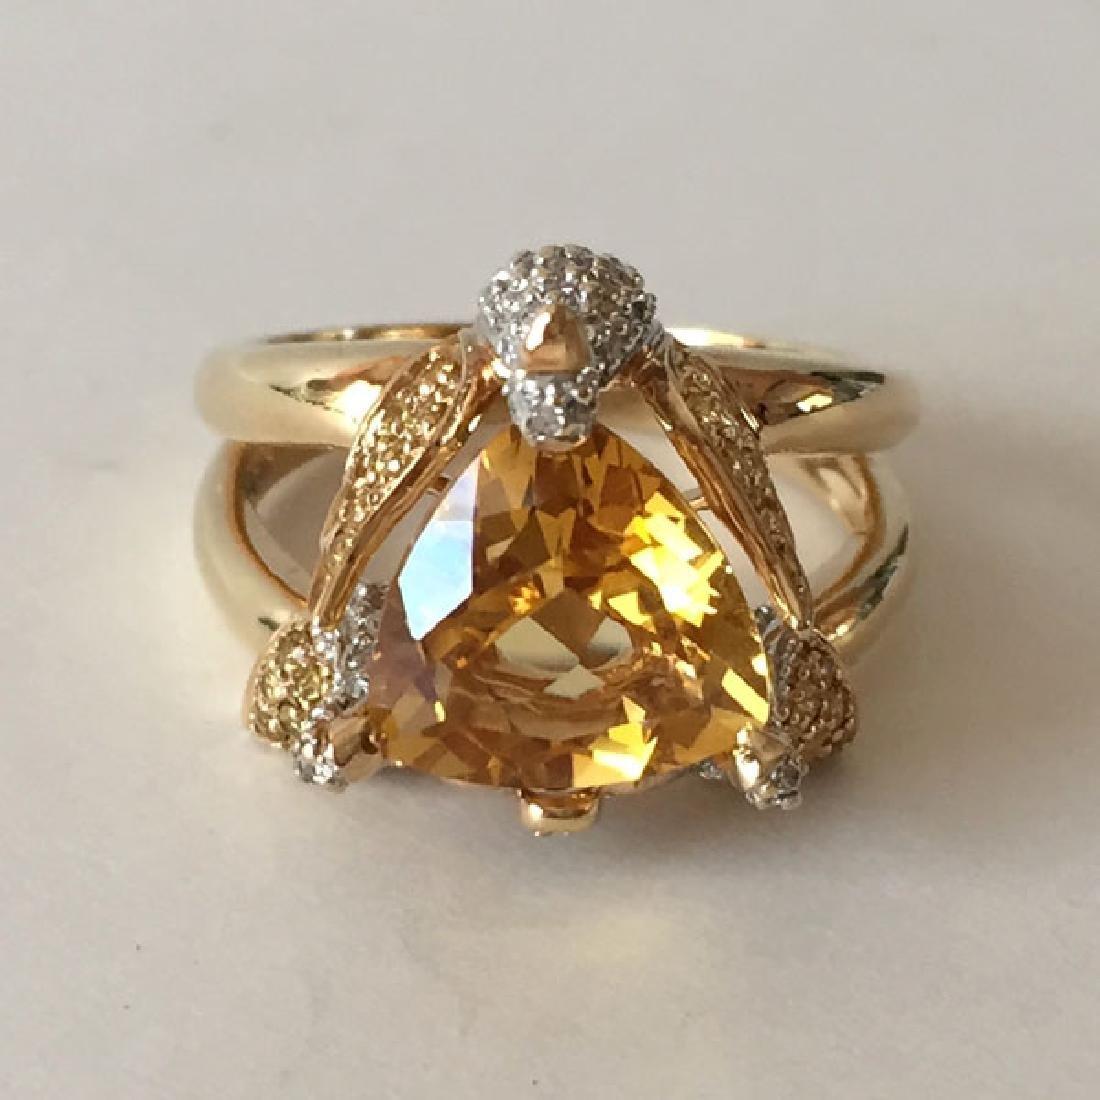 14k yellow gold white diamonds and yellow sapphires 3